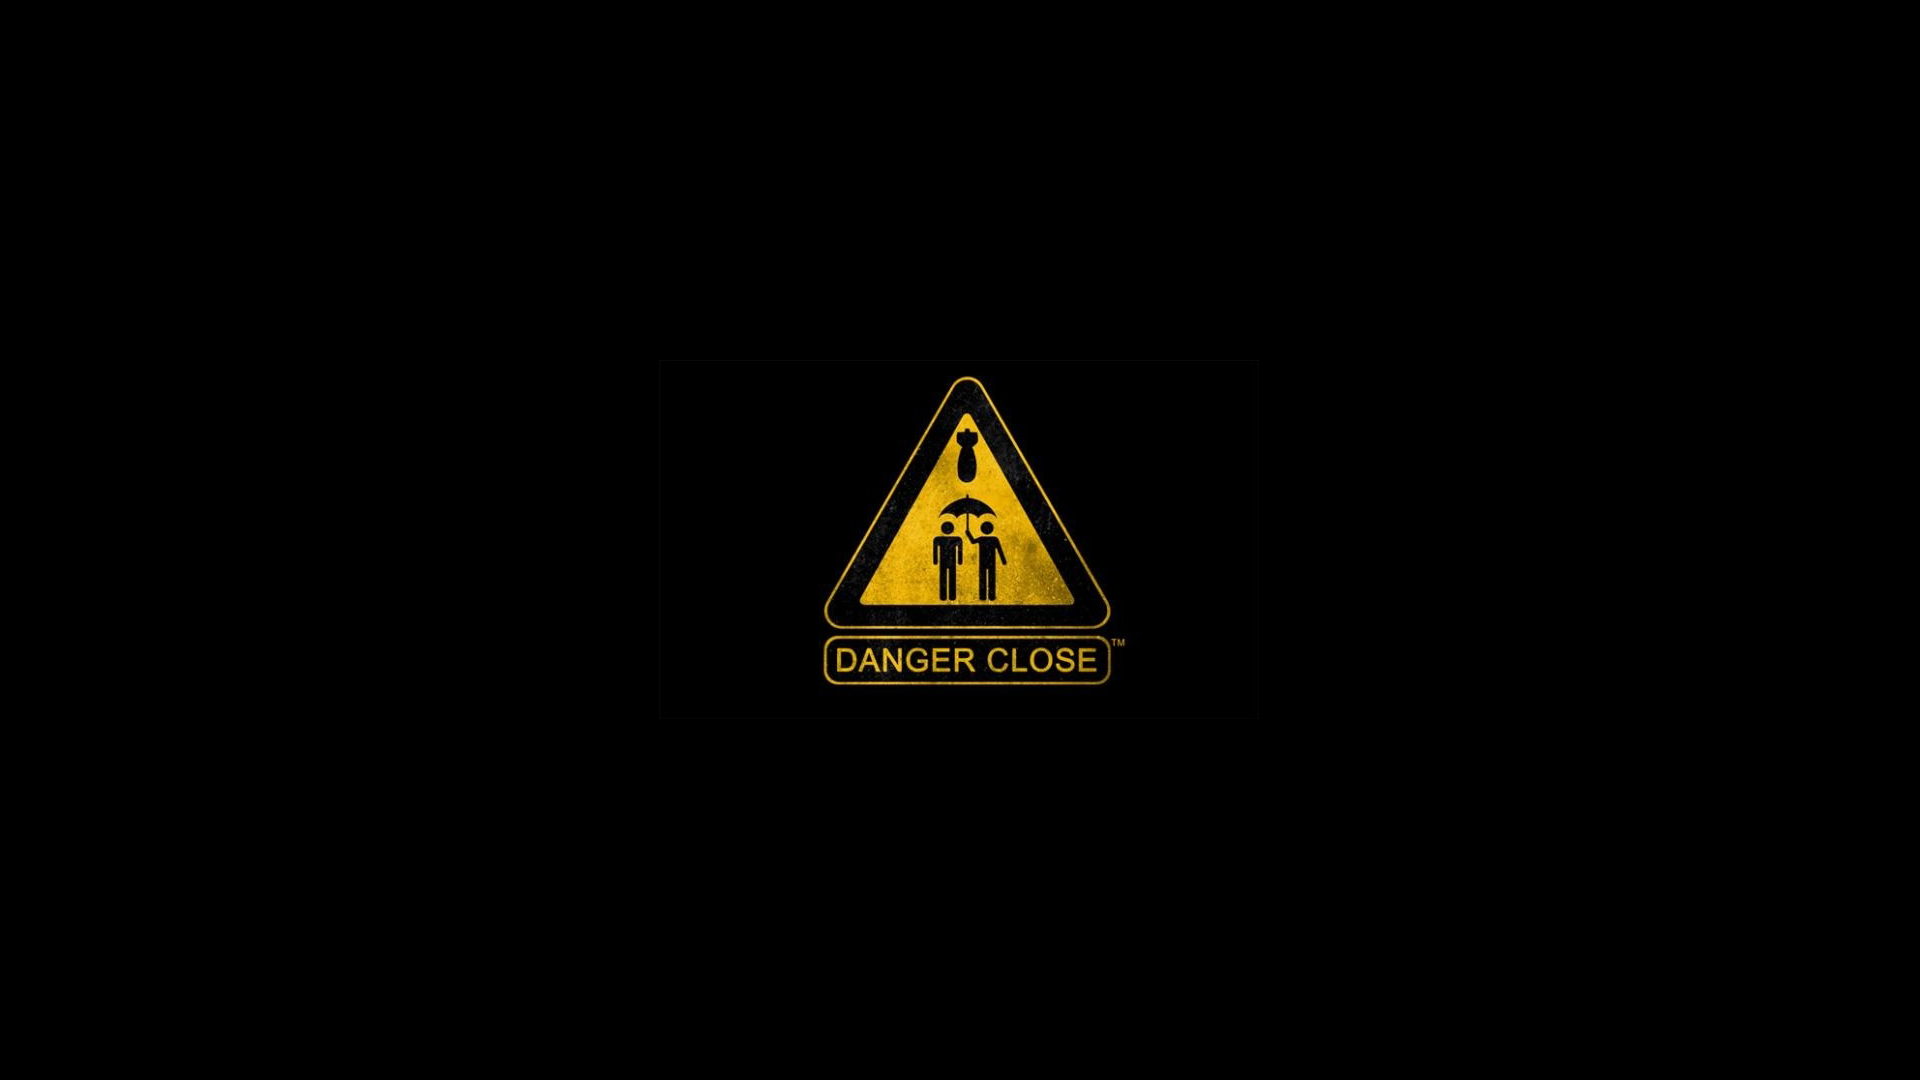 cayos general nsfw virus xxxiv thread image cupcakes gave random